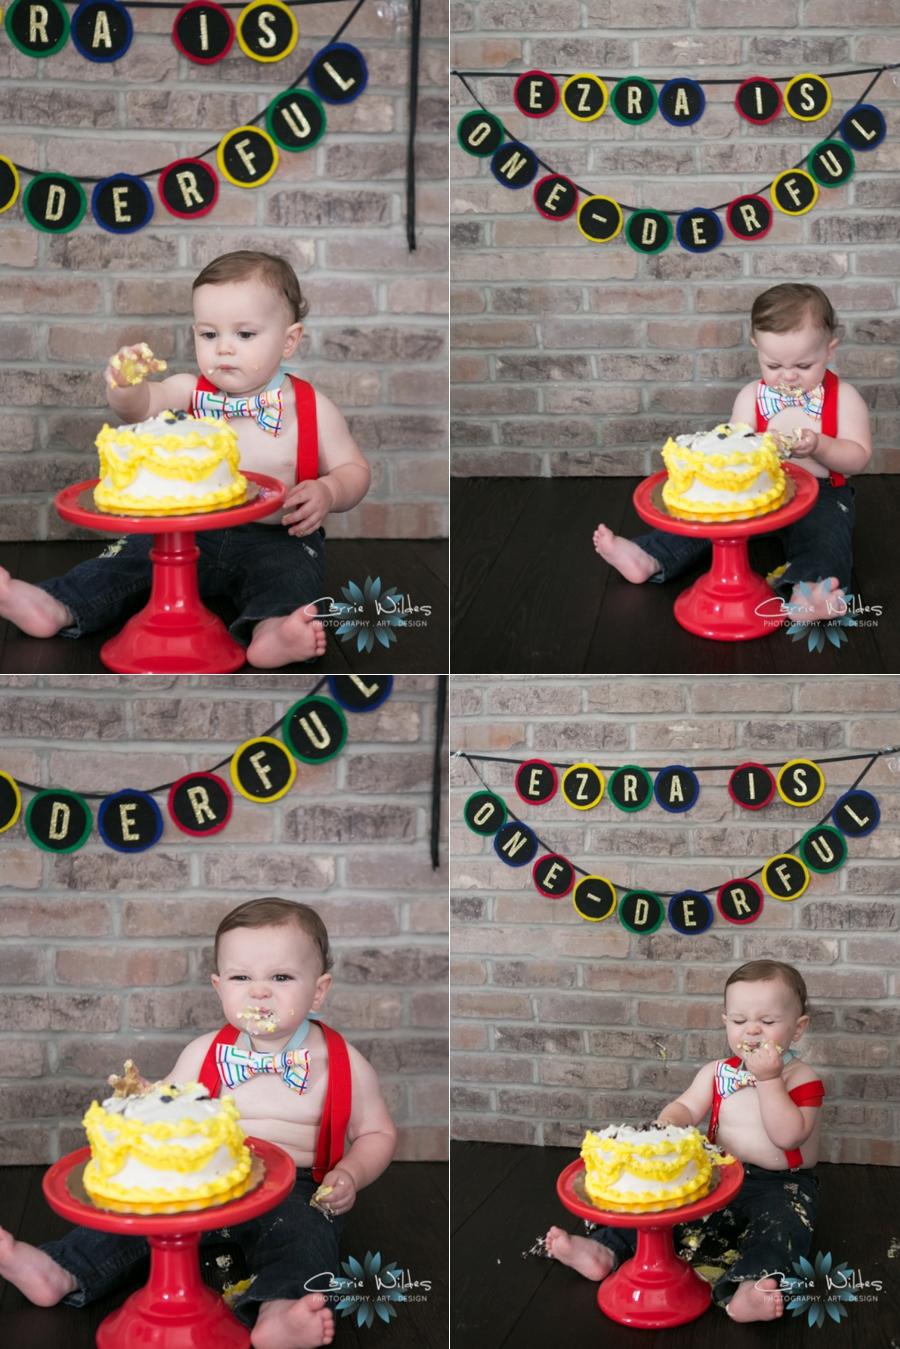 6_27_16 Tampa 1 year Old Cake Smash Portraits_0007.jpg